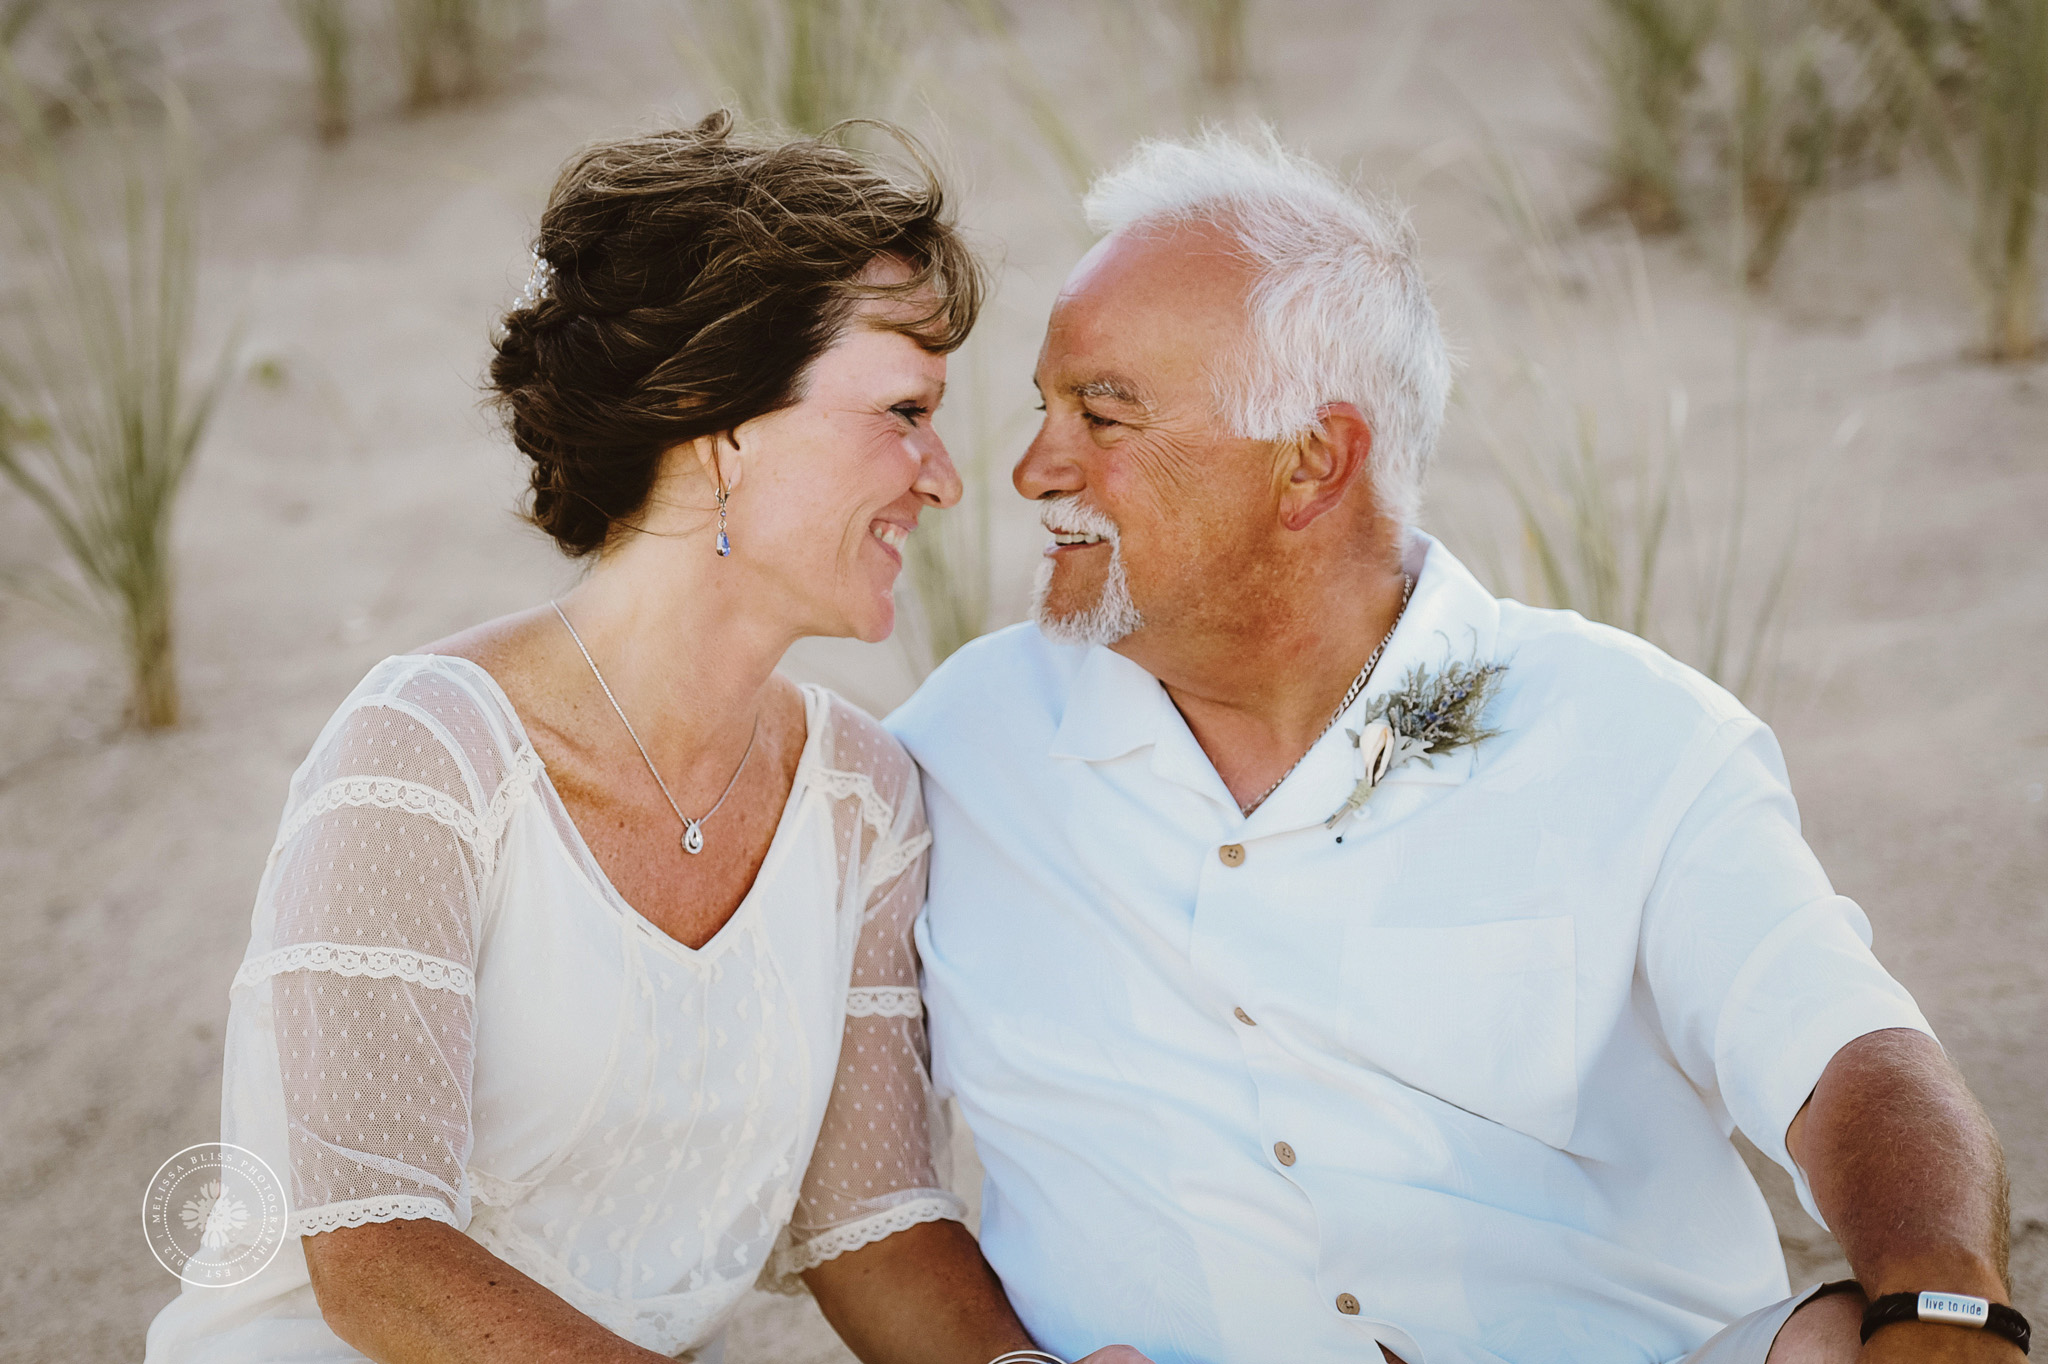 norfolk-wedding-photographer-virginia-beach-wedding-photographer-williamsburg-wedding-photographer-sandbridge-beach-wedding-day-melissa-bliss-photography